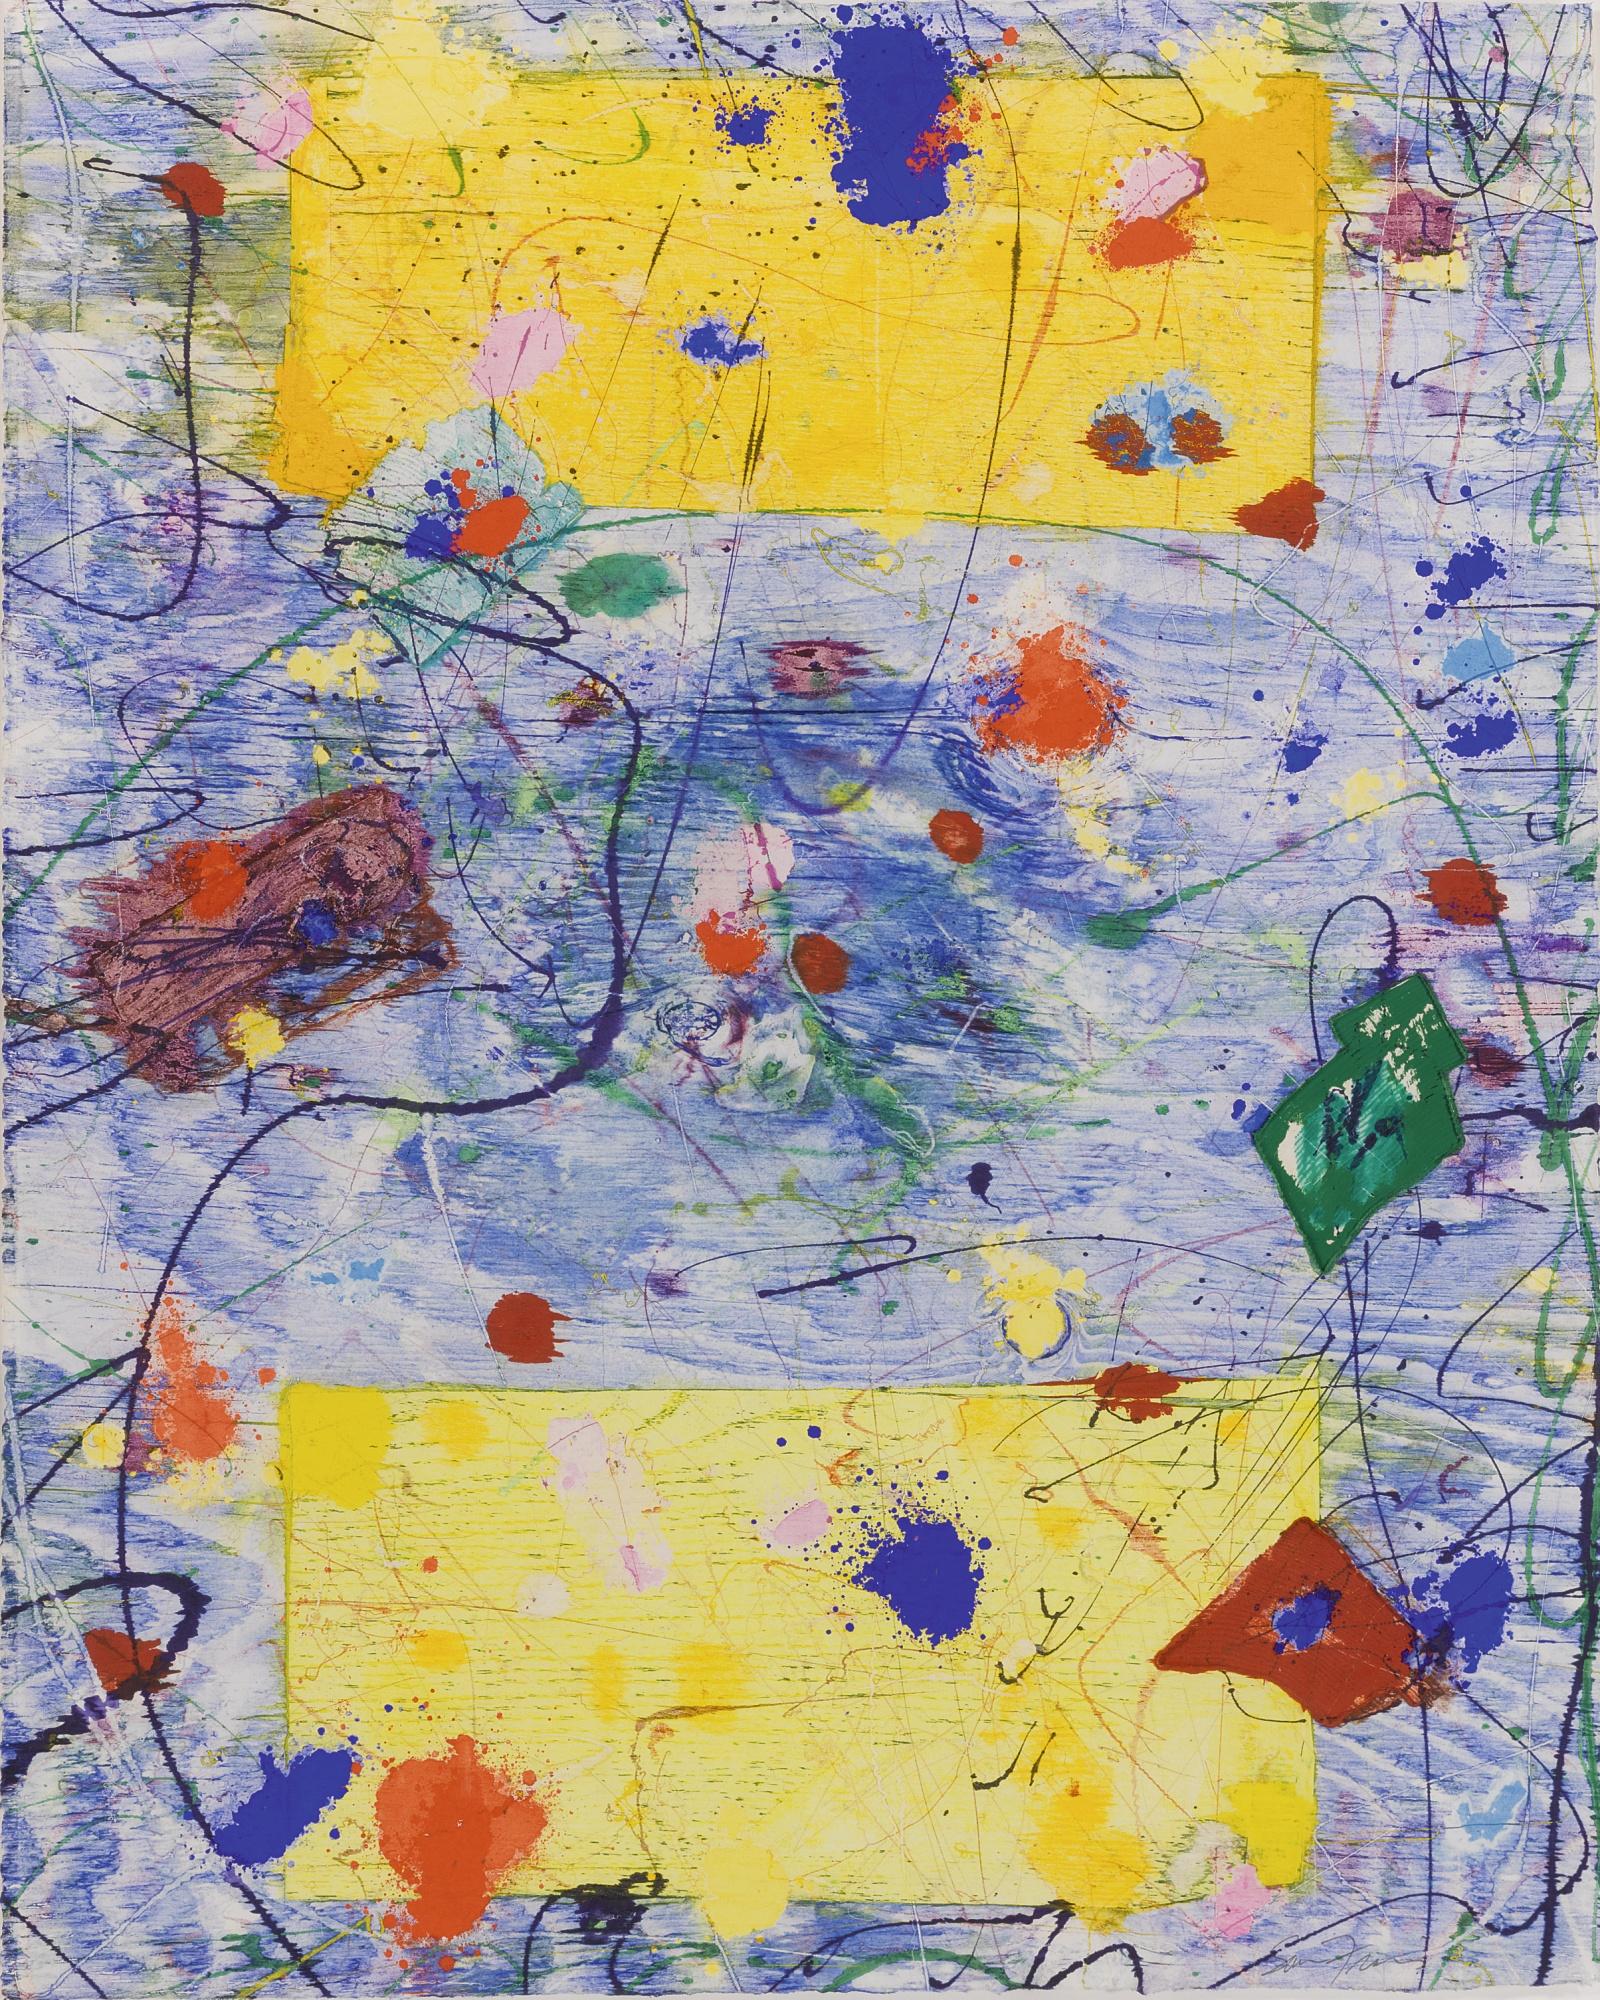 Sam Francis-Untitled [Exp-Sf-57-#7]-1982